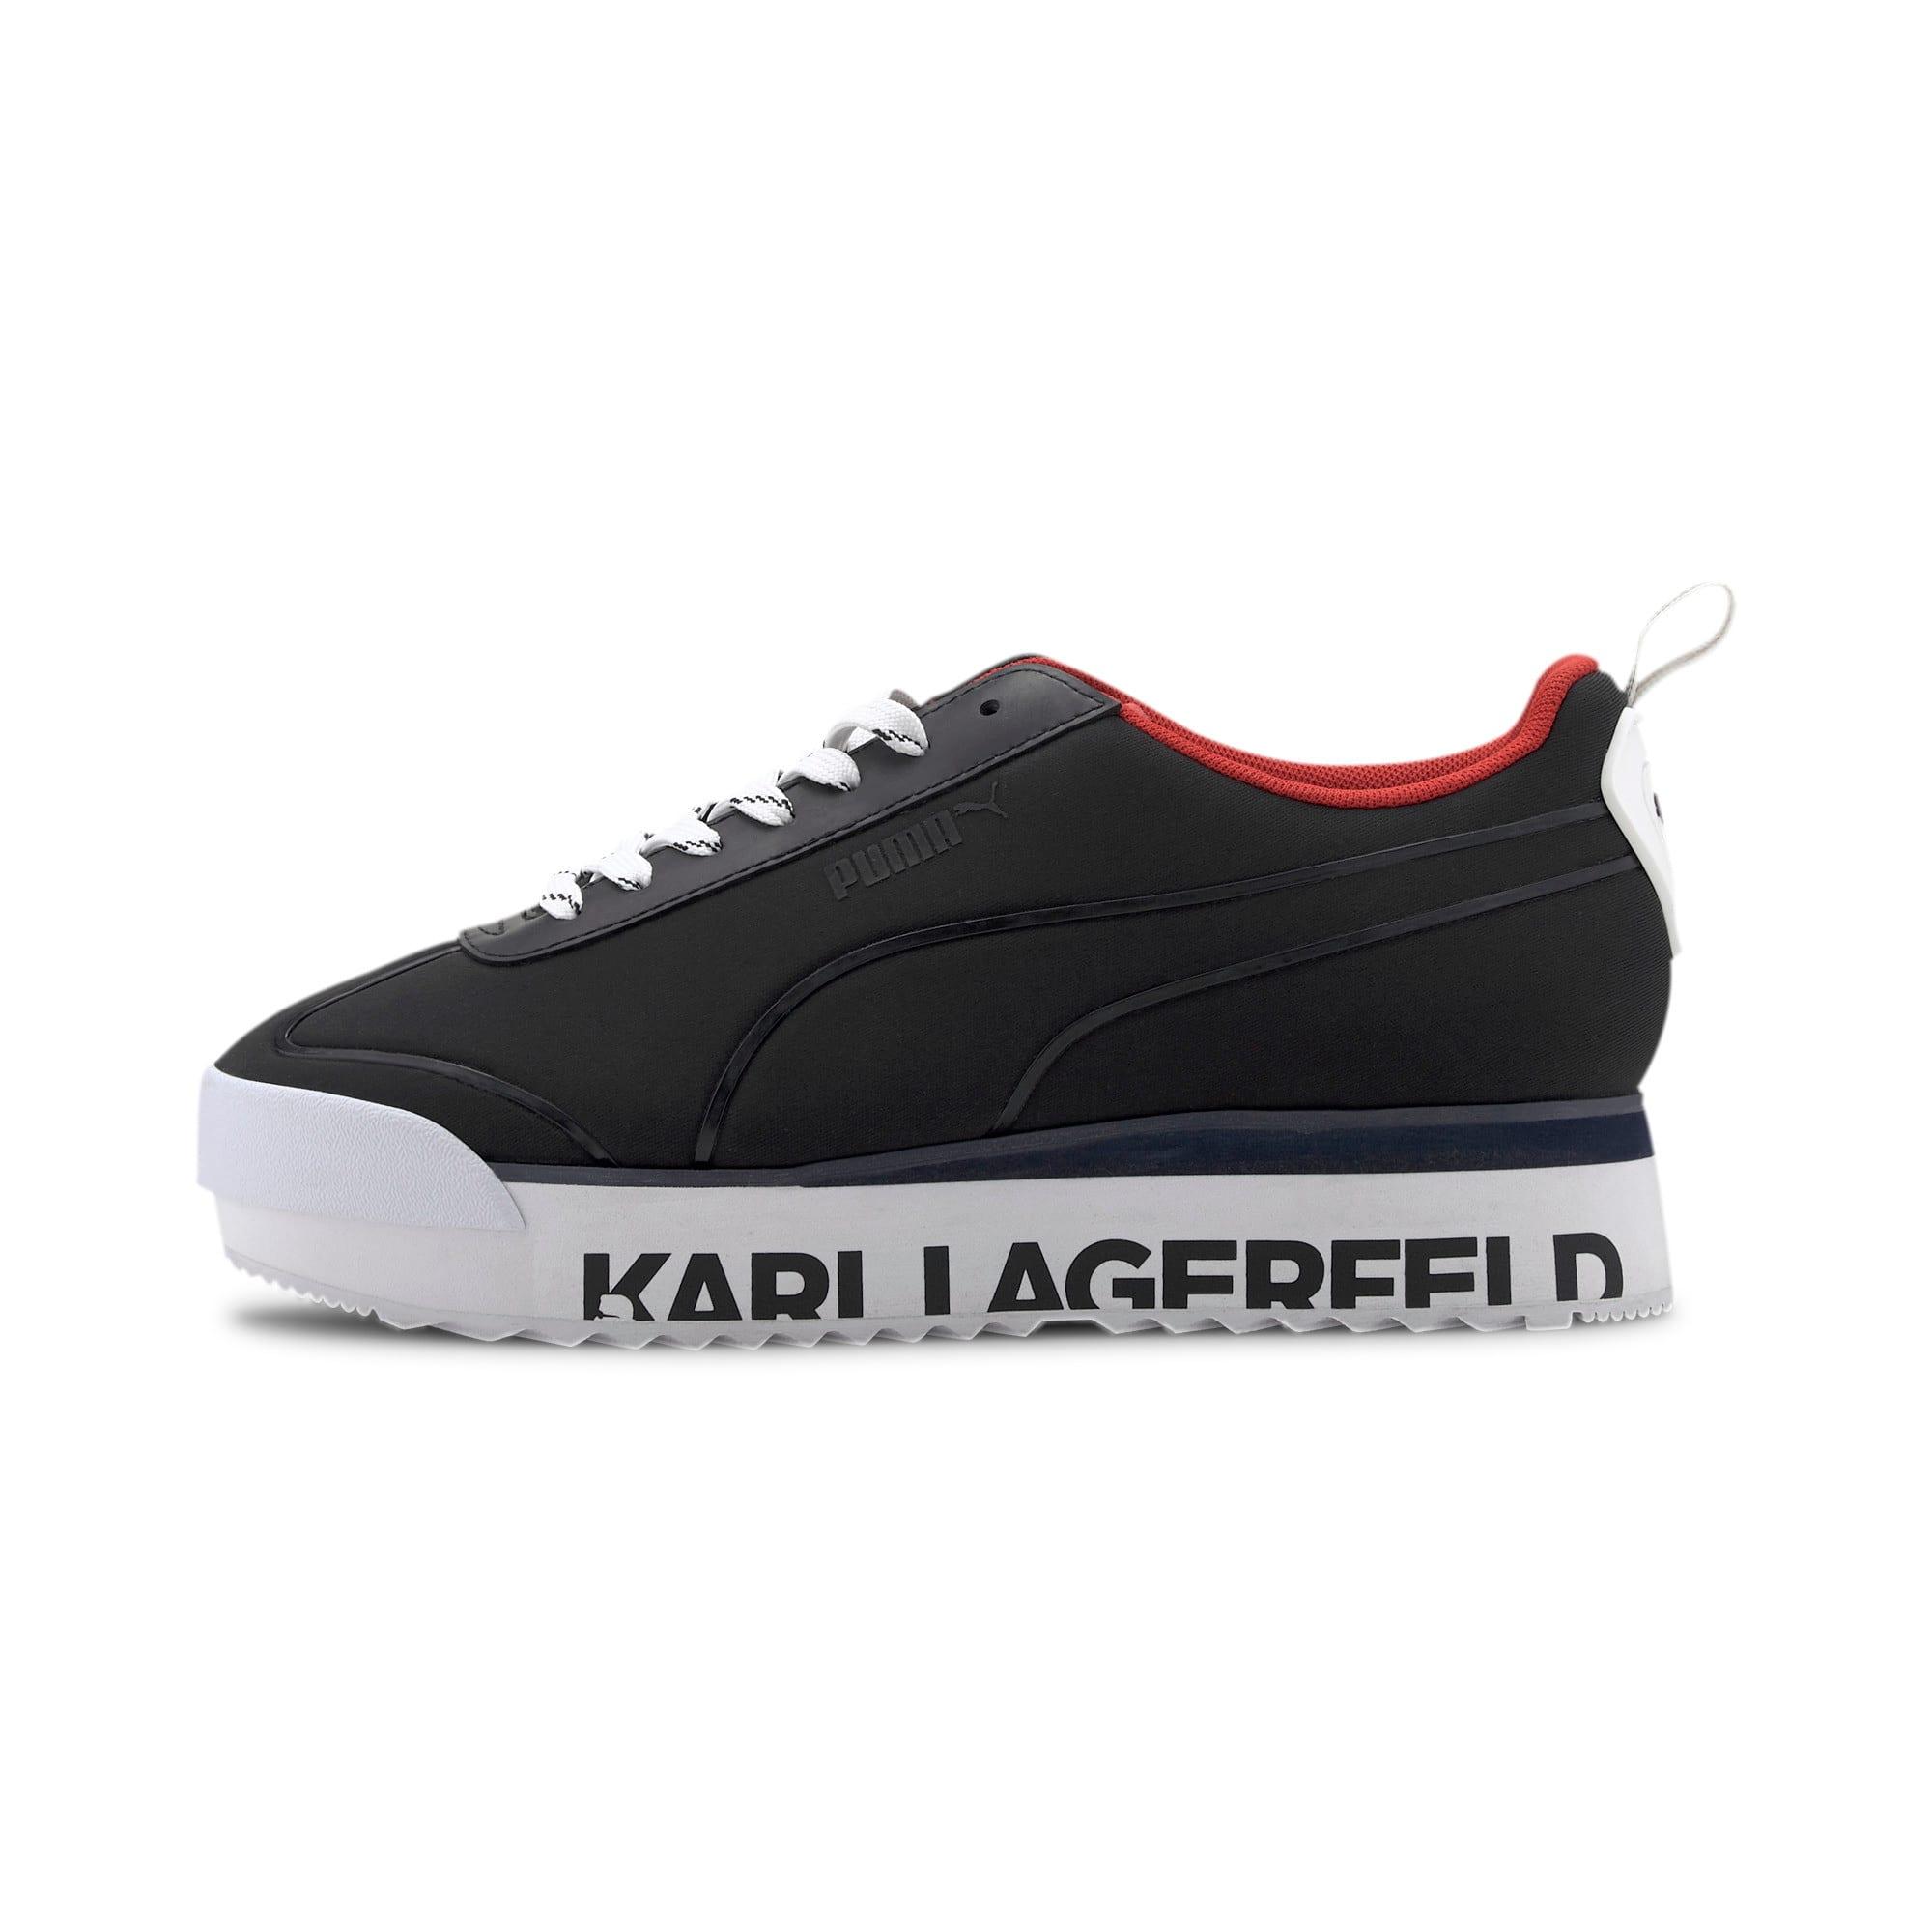 Thumbnail 1 of PUMA x KARL LAGERFELD Roma Amor Sneaker, Puma Black-Puma Black, medium